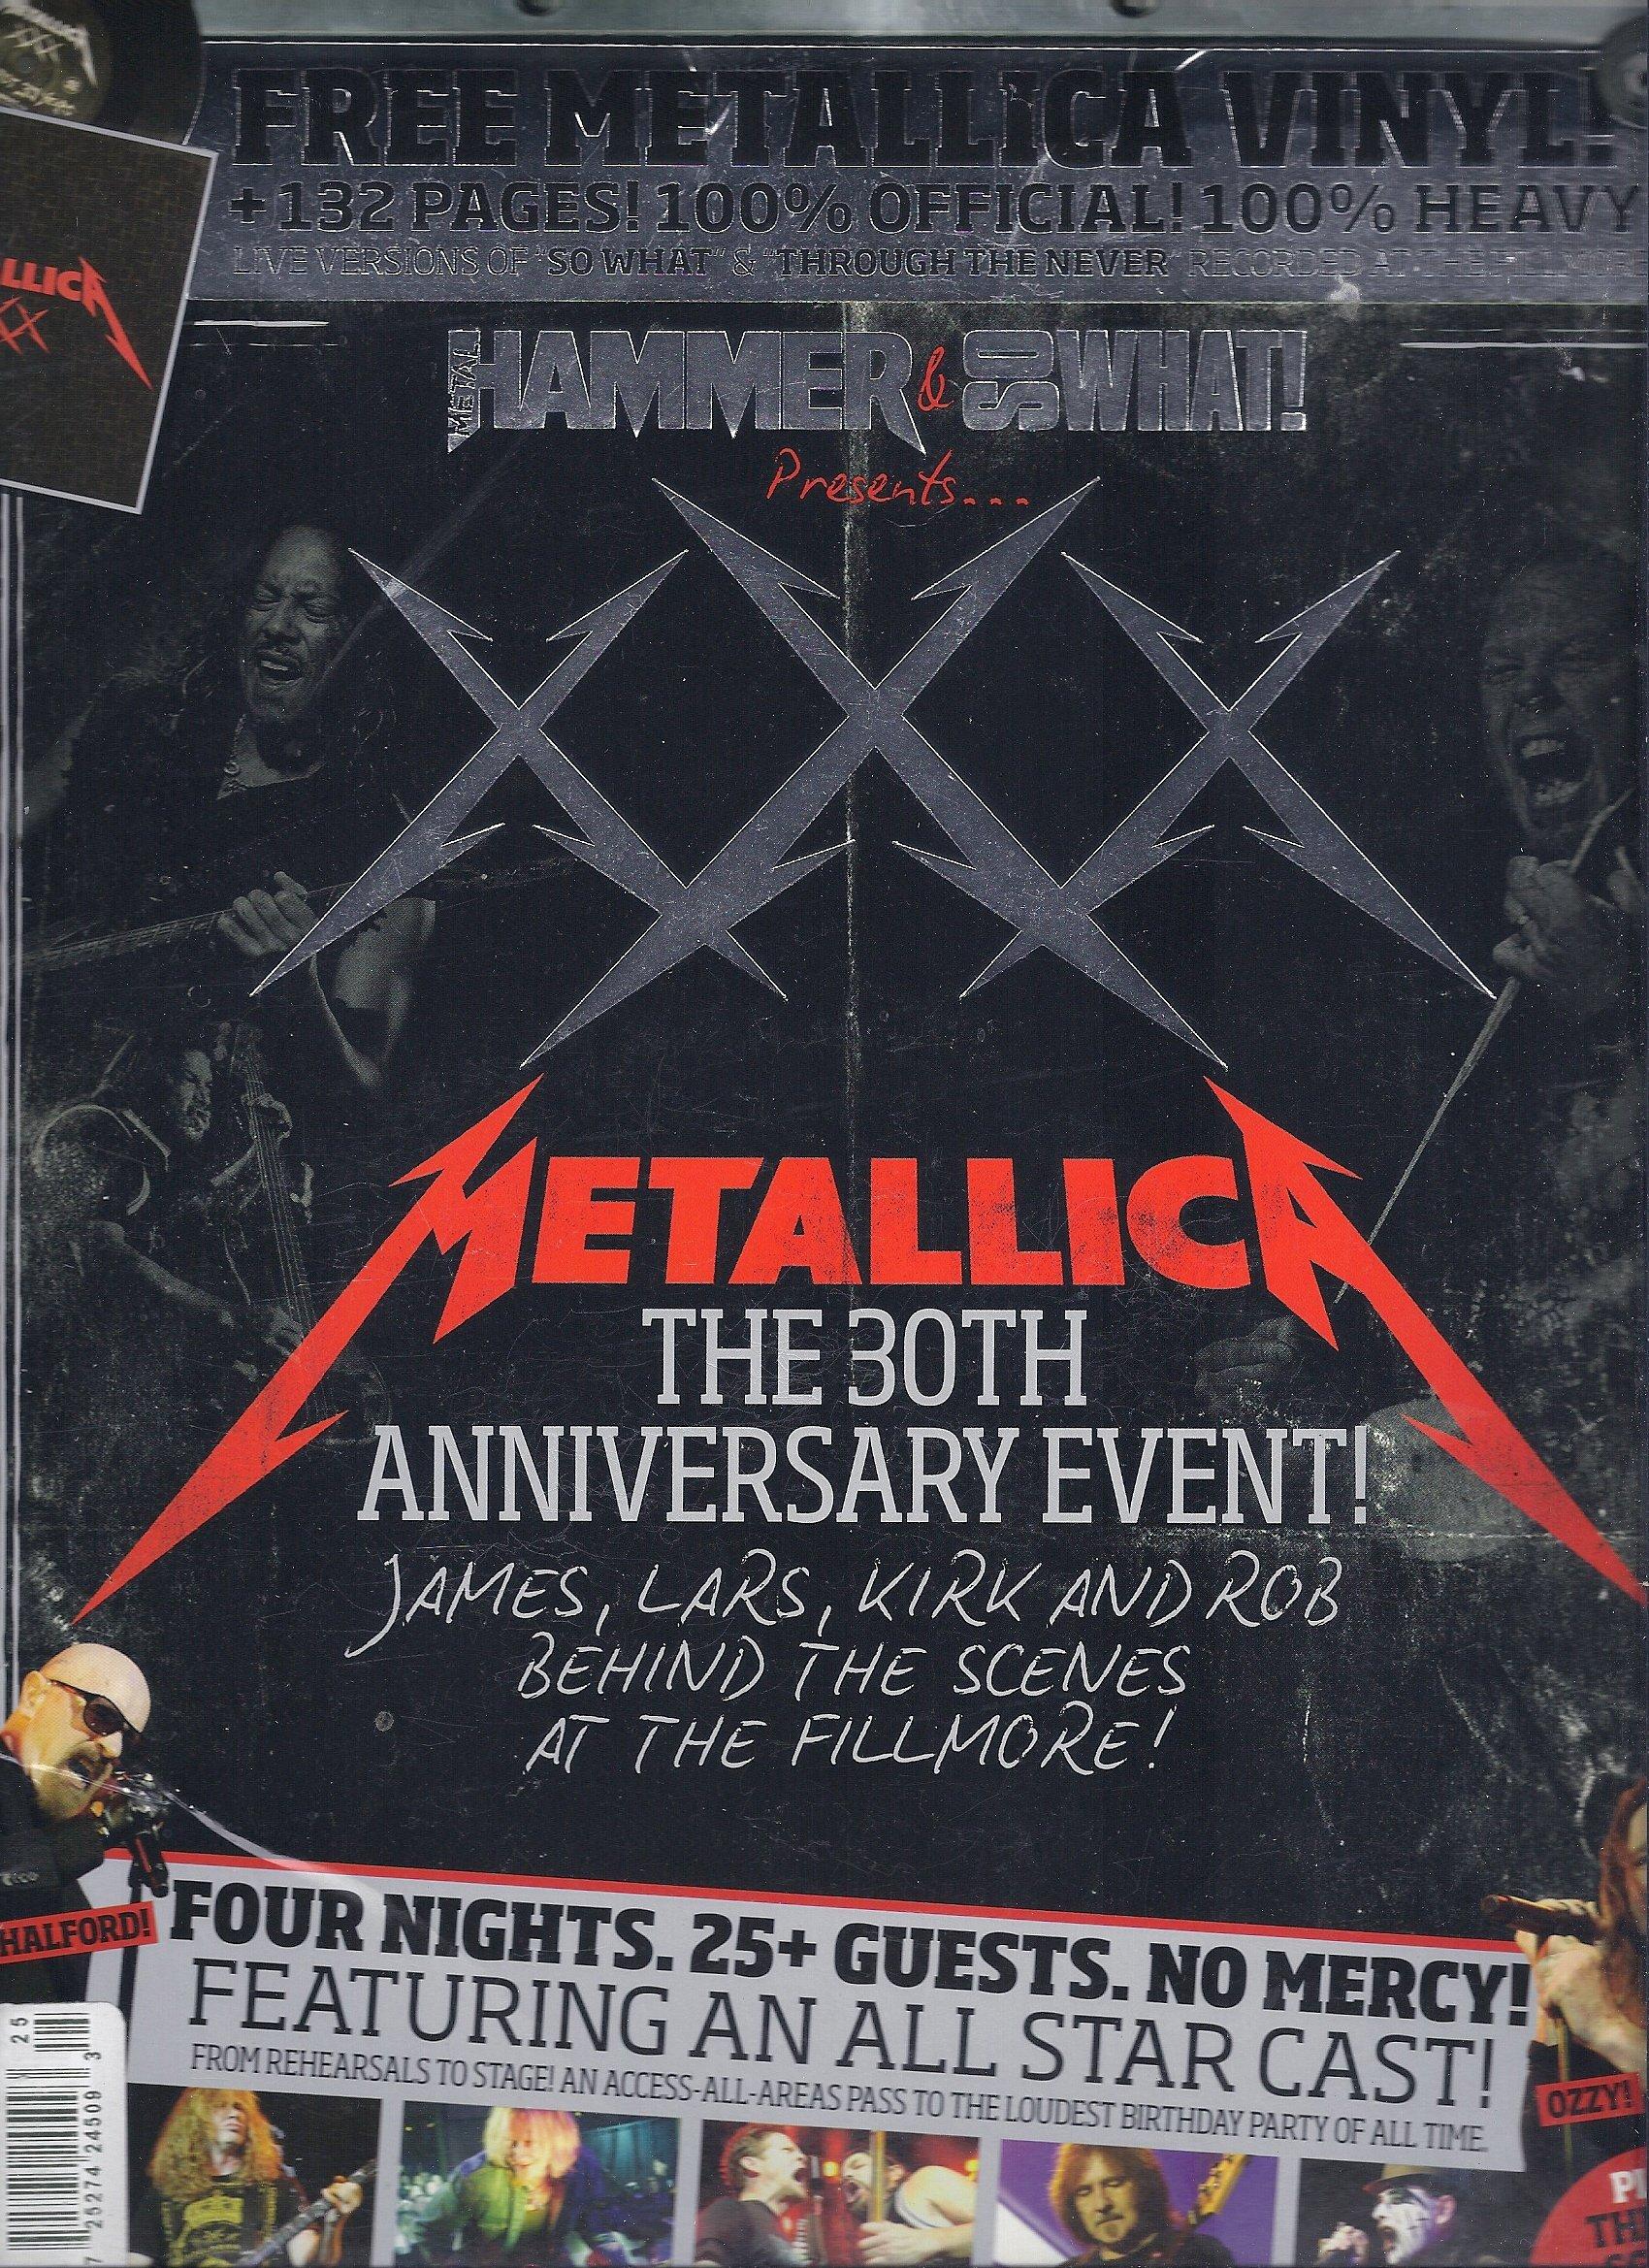 Metal Hammer & So What Presents Metallica (30th Anniversary